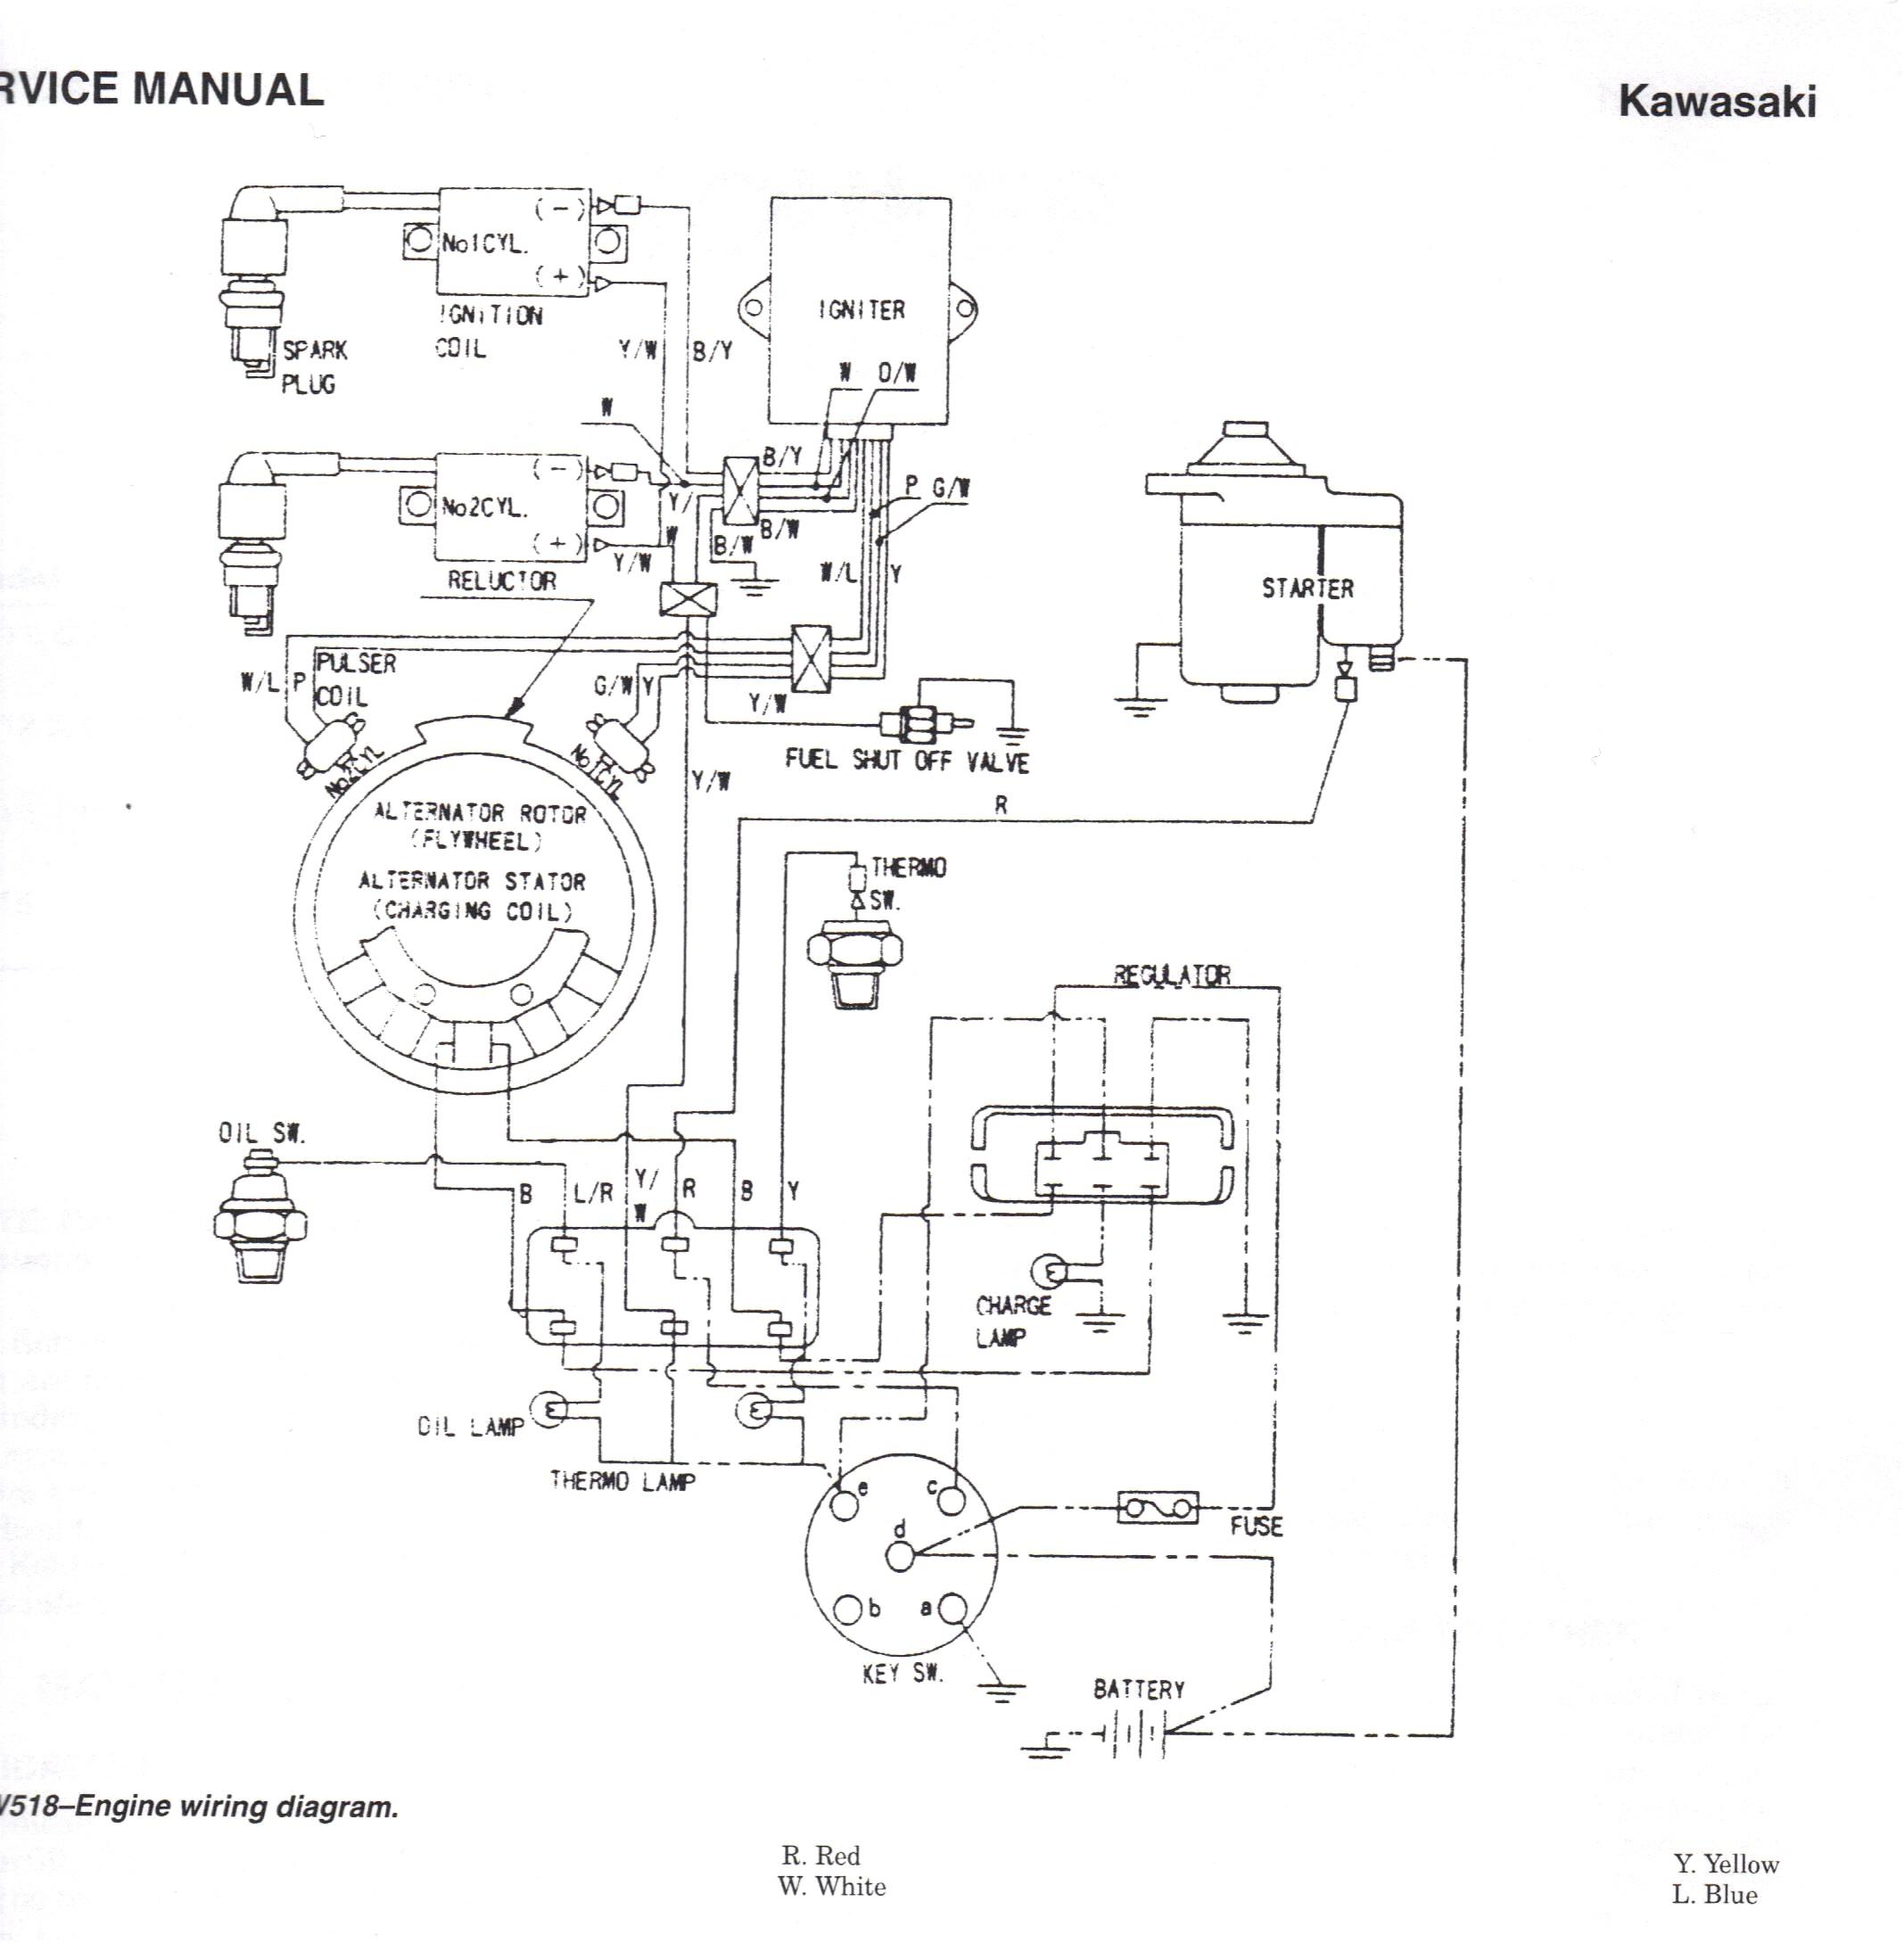 John Deere D140 Electrical Schematic John Deere Lt133 Wiring Diagram General Wiring Diagram Of John Deere D140 Electrical Schematic